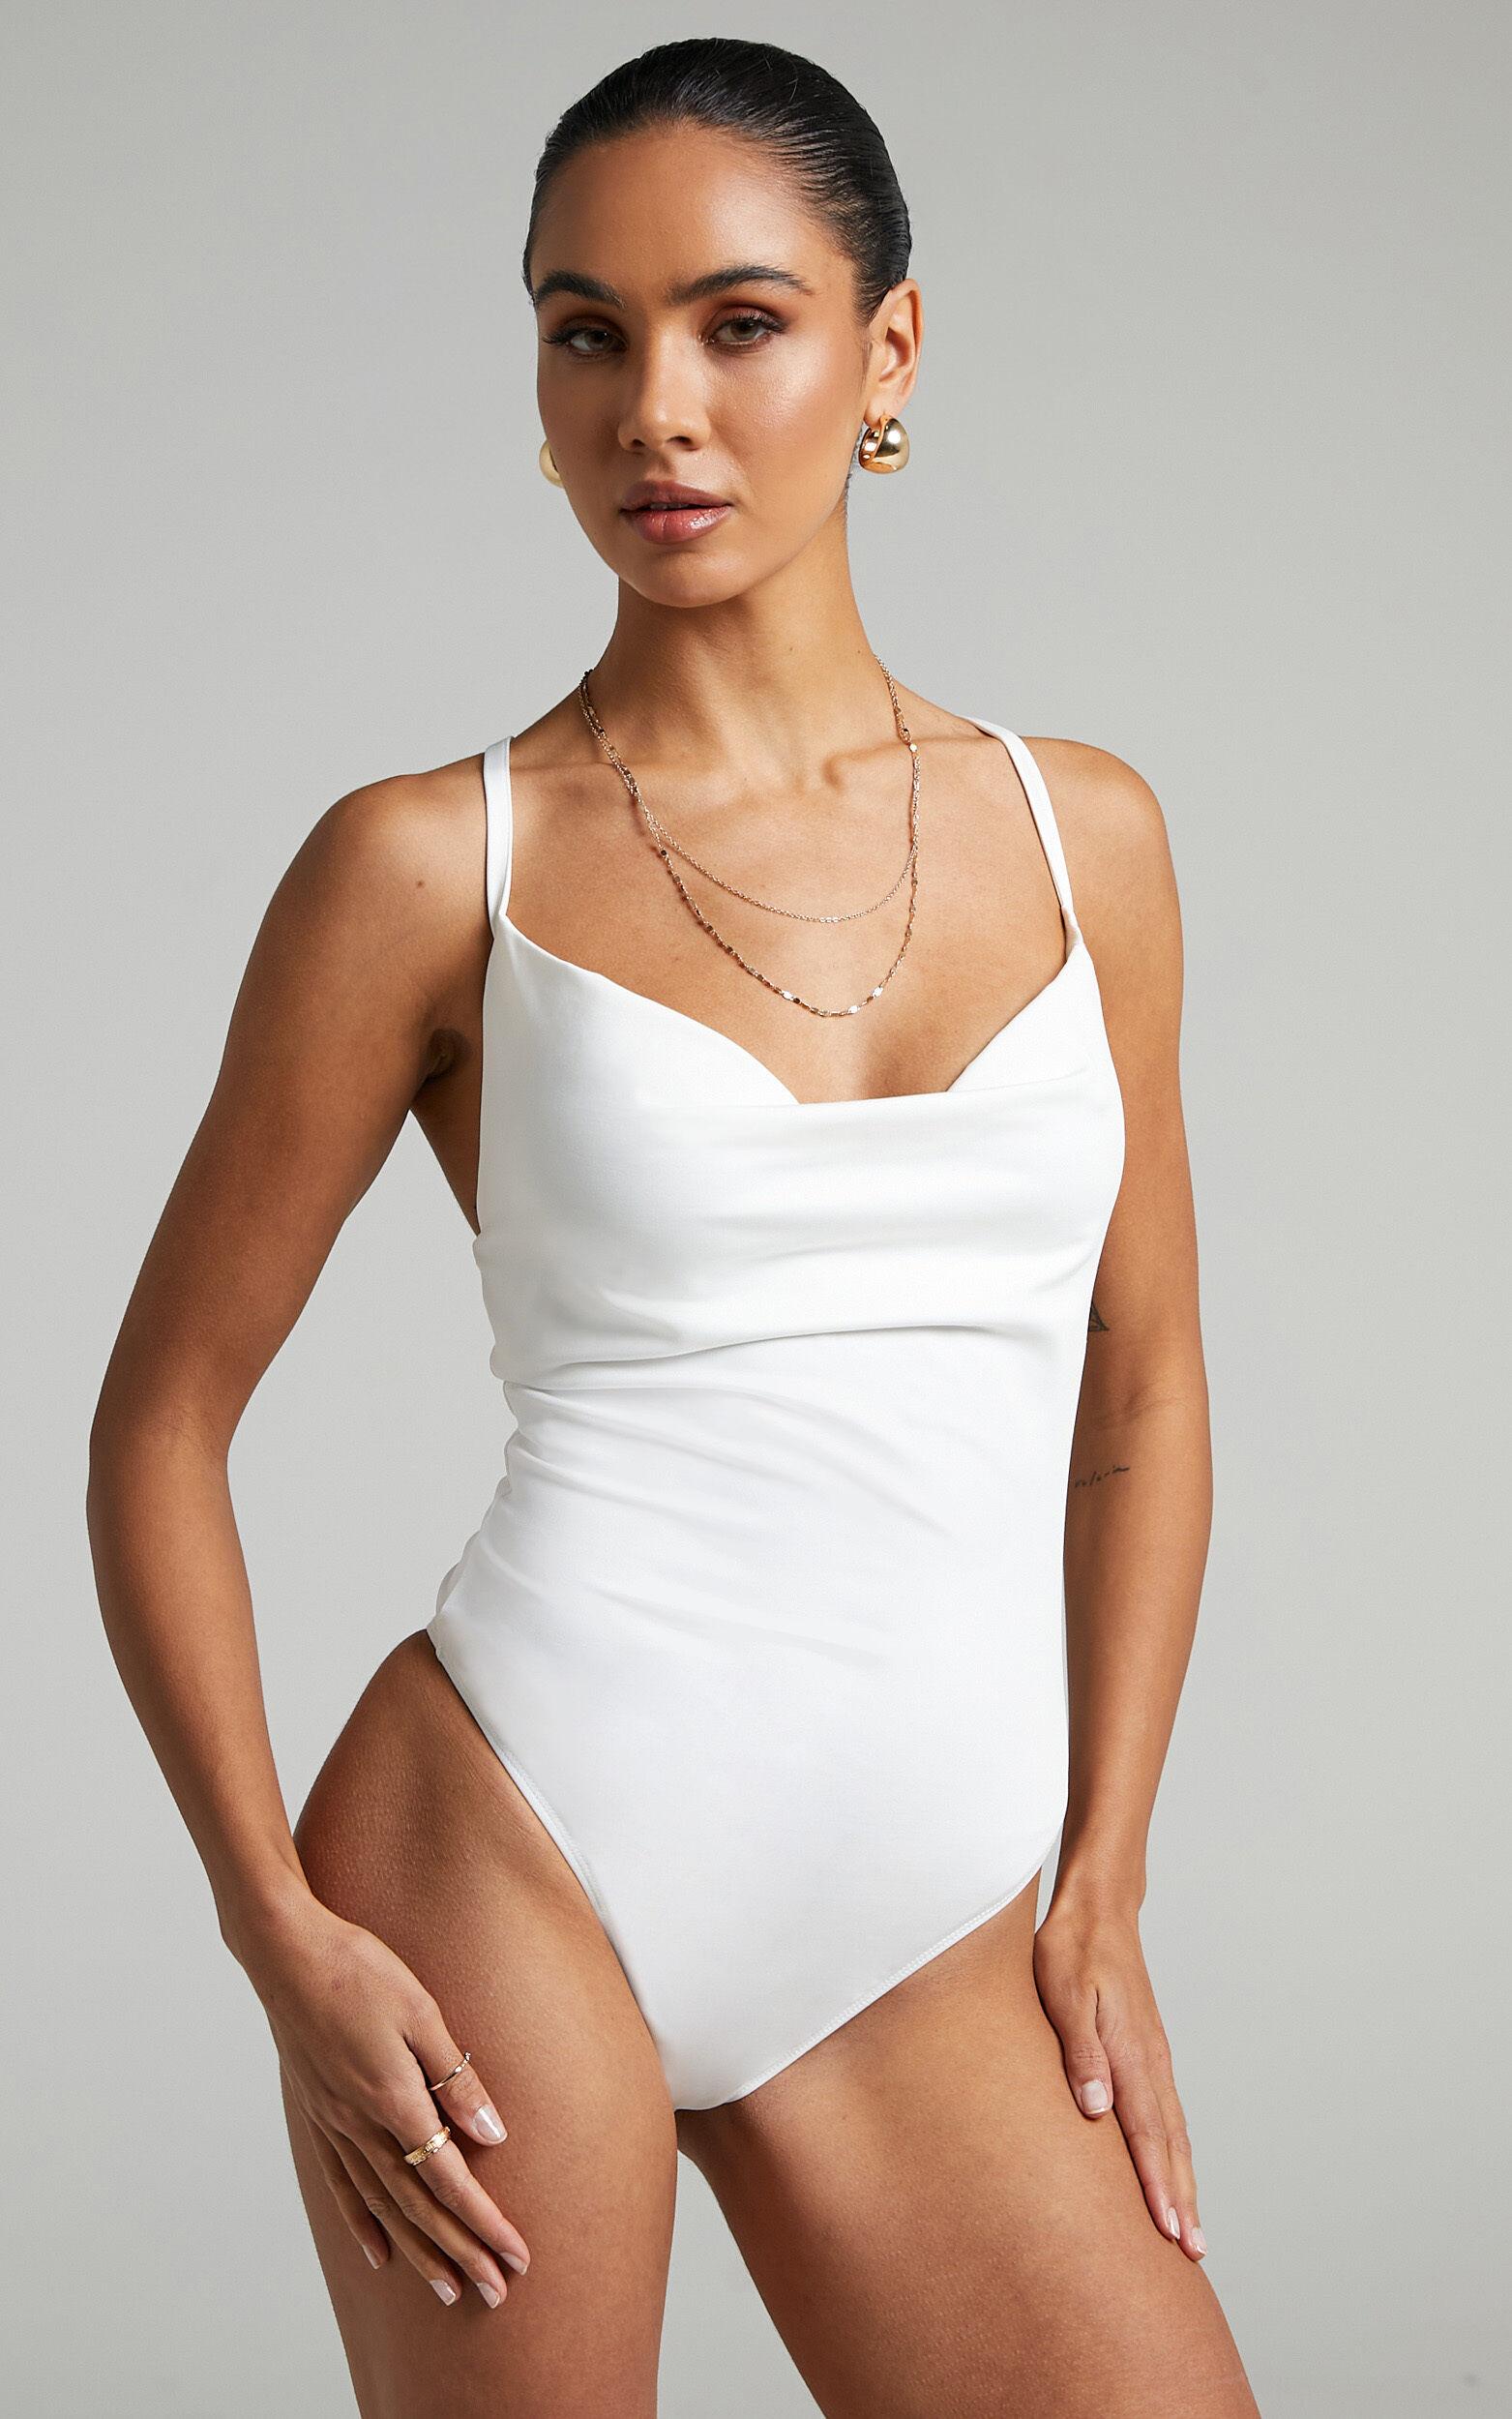 Emrie Cowl Neck Bodysuit in White - 06, WHT3, super-hi-res image number null